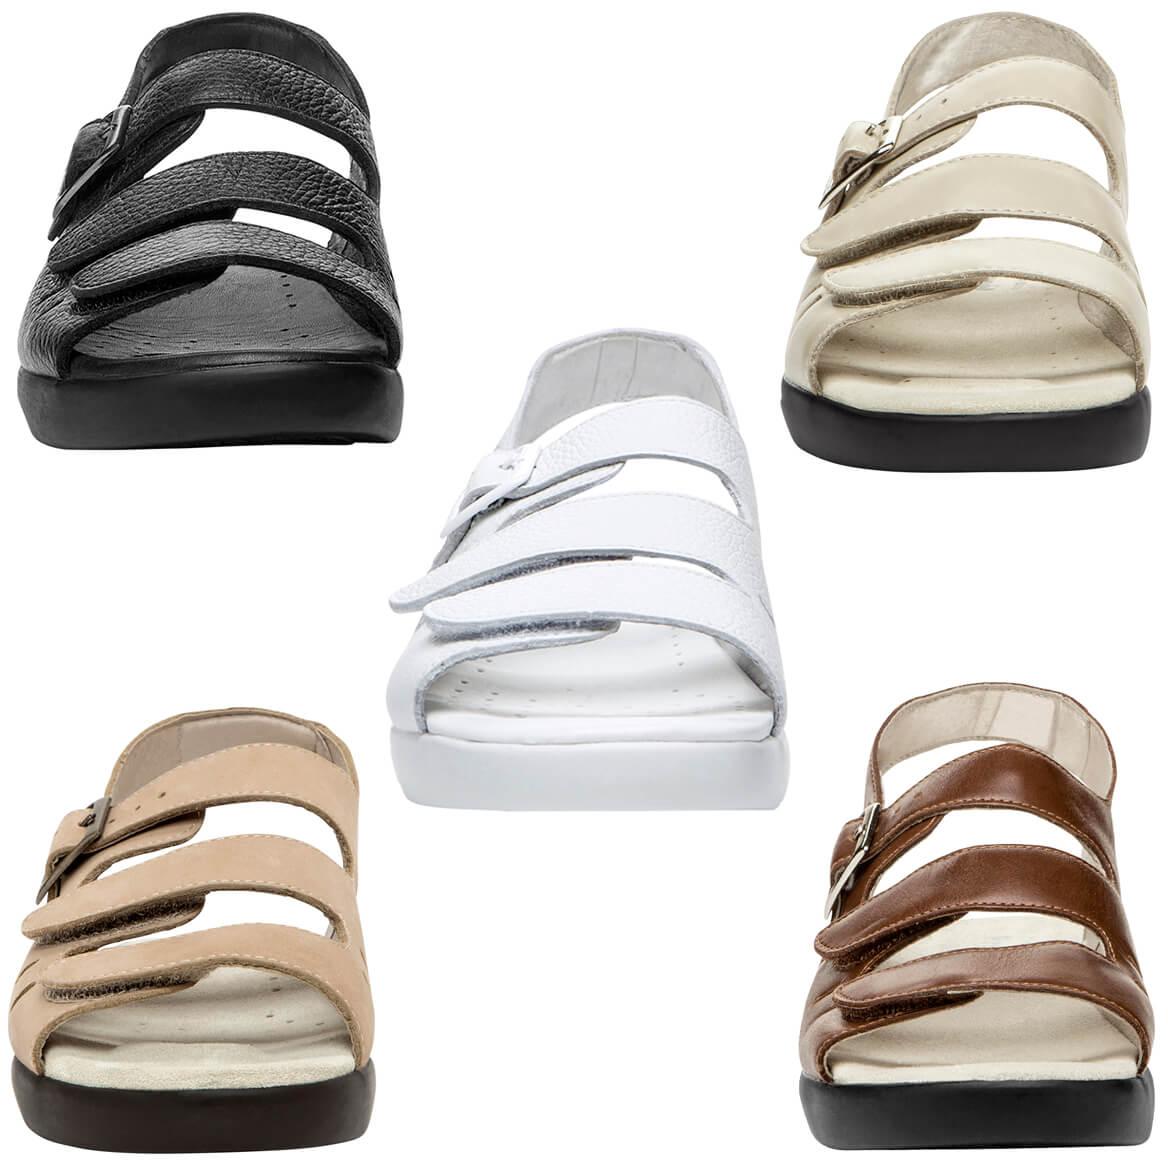 Propet® Breeze Womens Sandal - RTV-367984